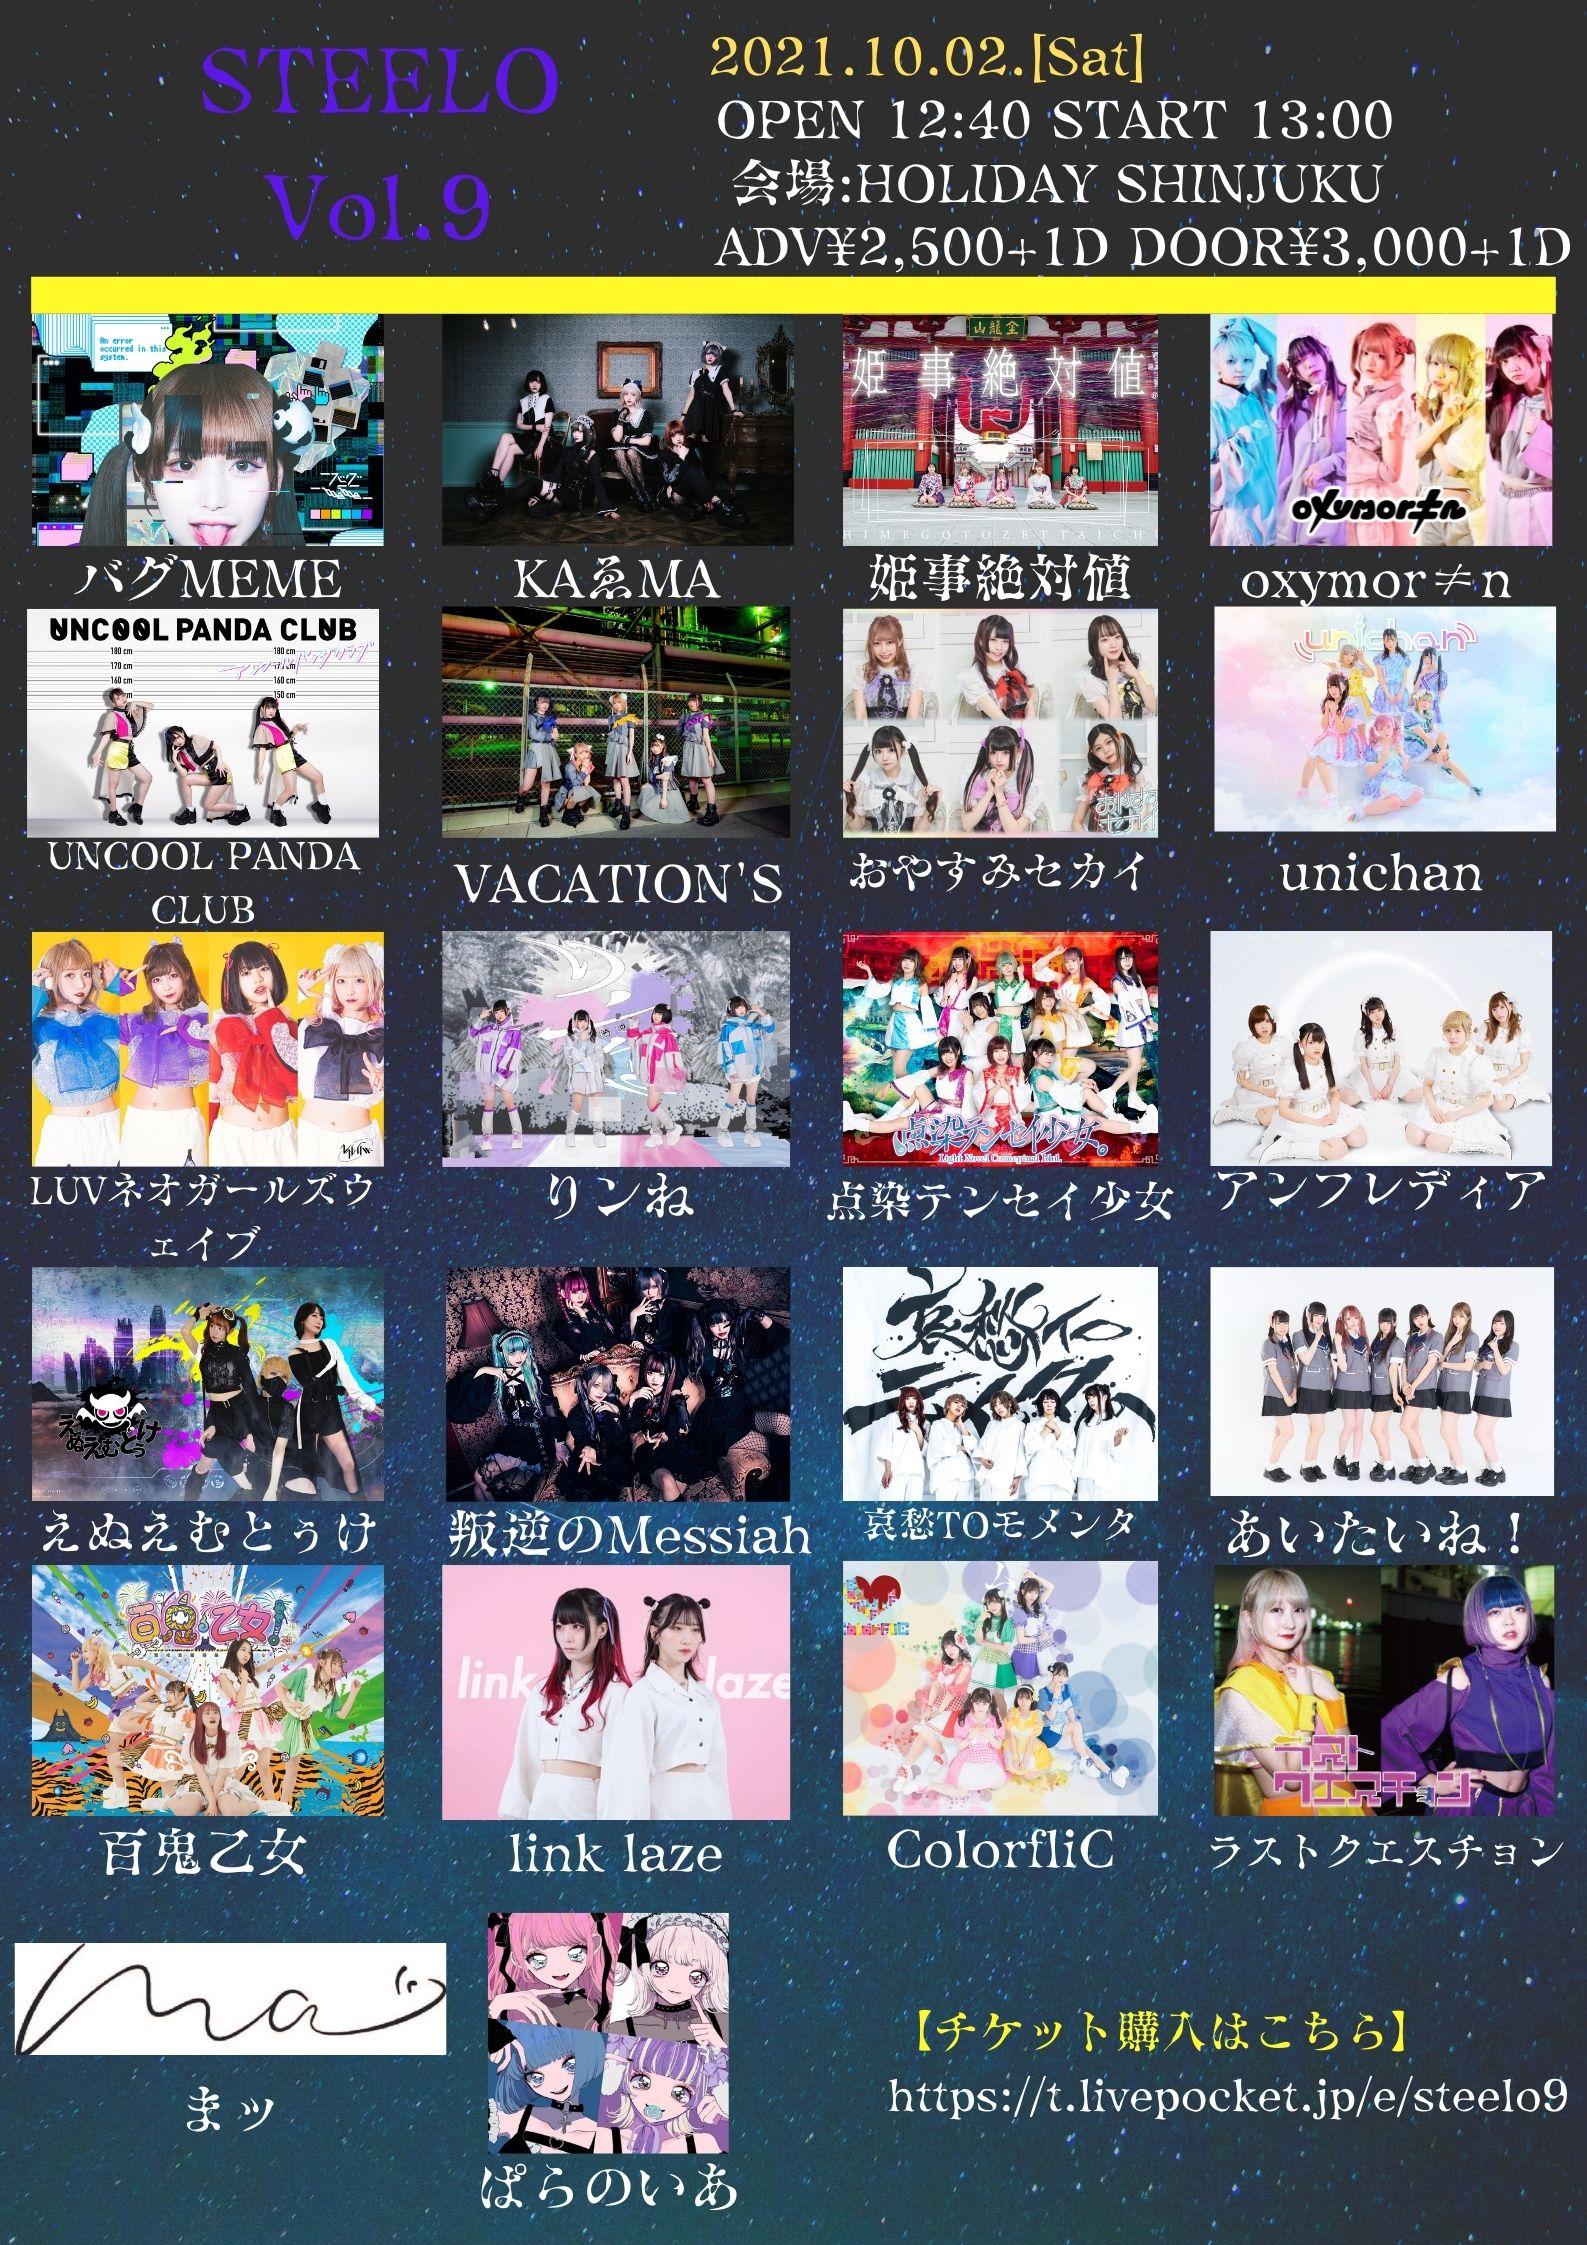 バグMEME10月定期公演「STEELO Vol.9」